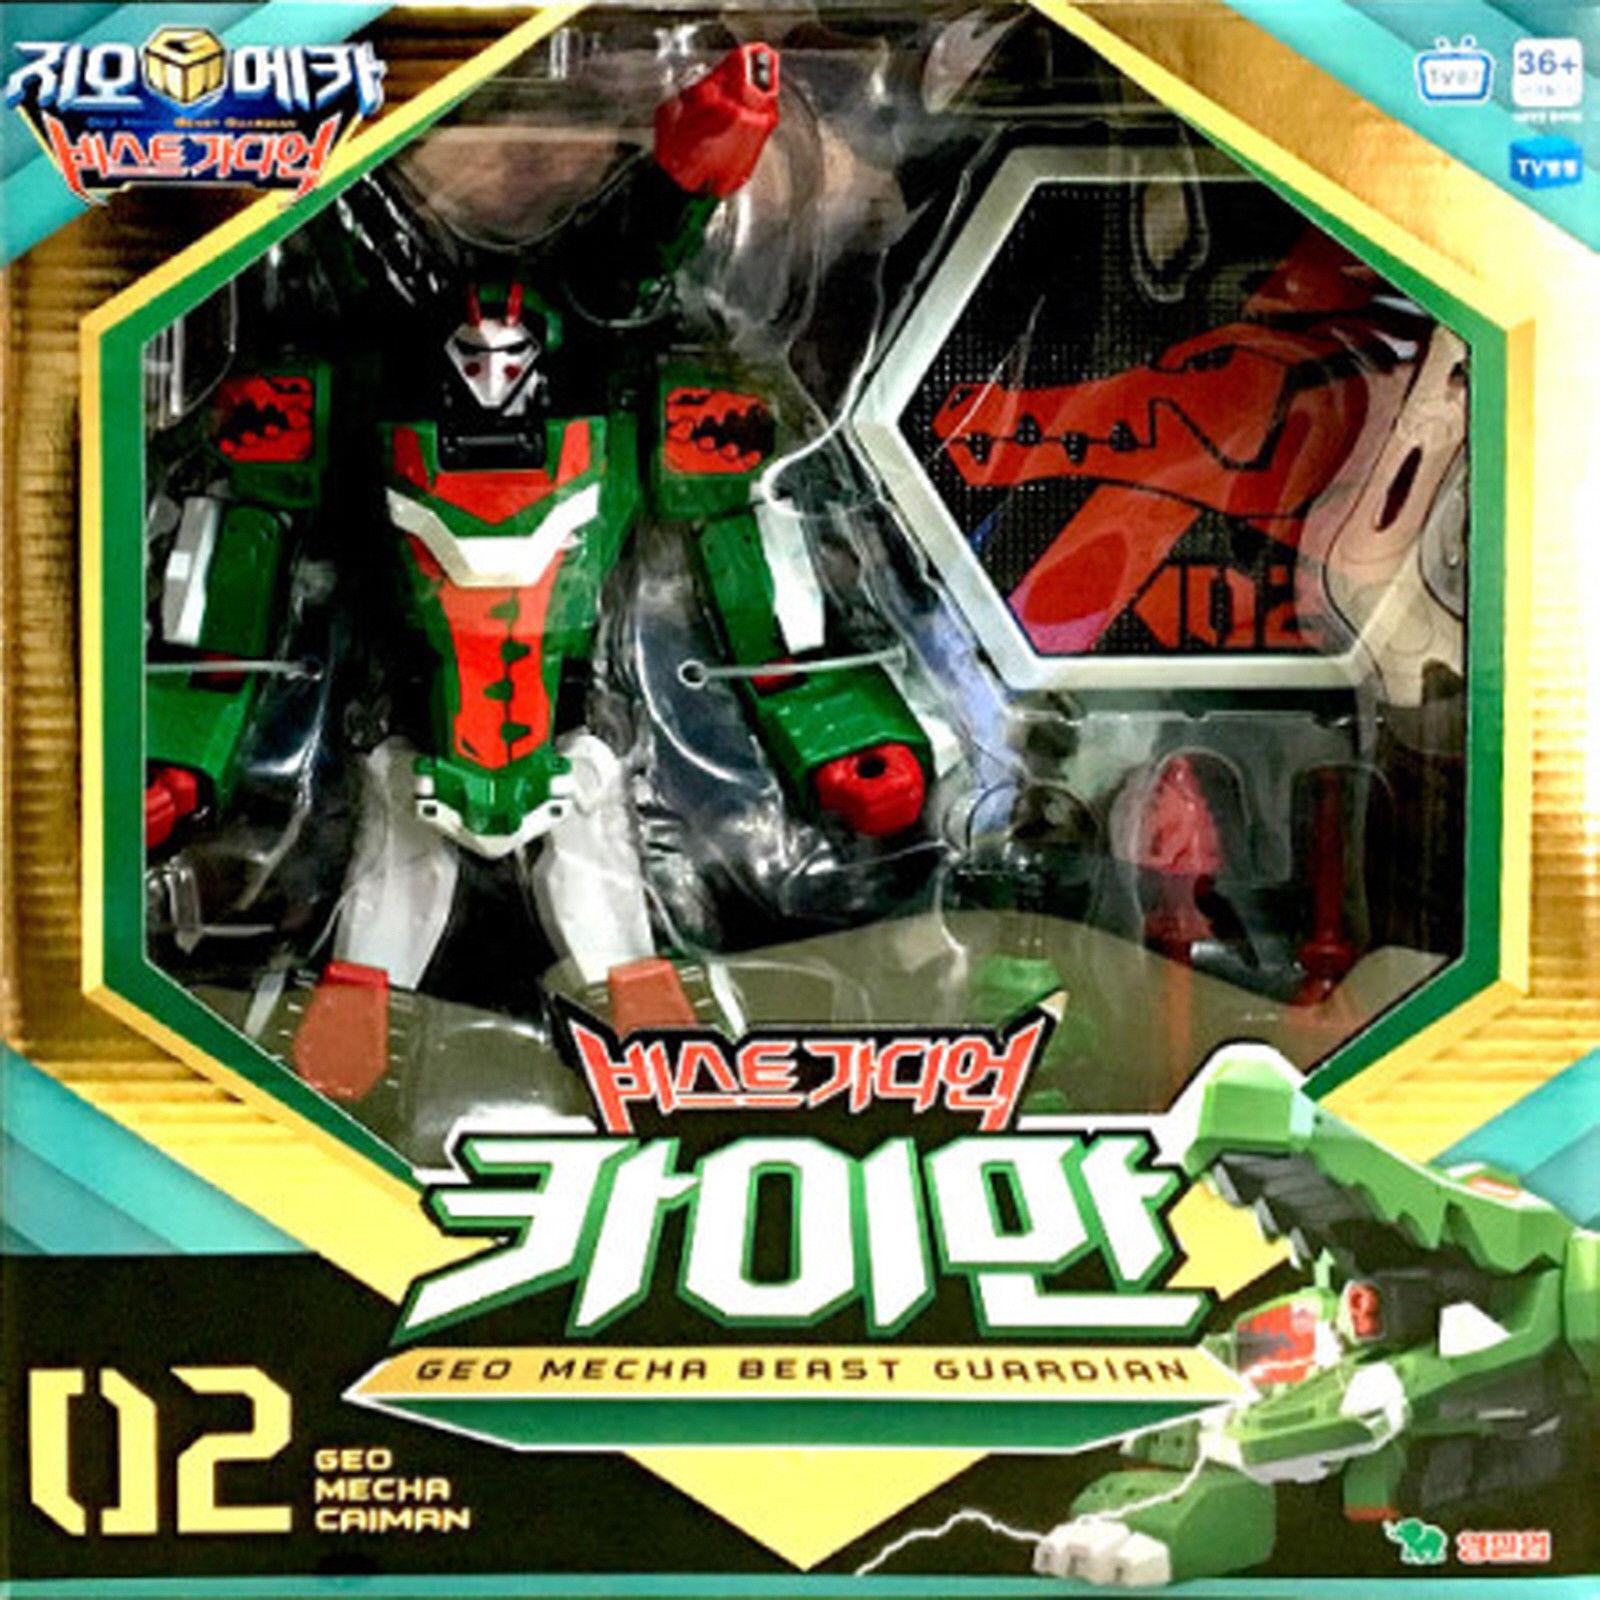 Geo Mecha Beast Guardian CAIMAN Transformer Robot Alligator Toy Action Figure